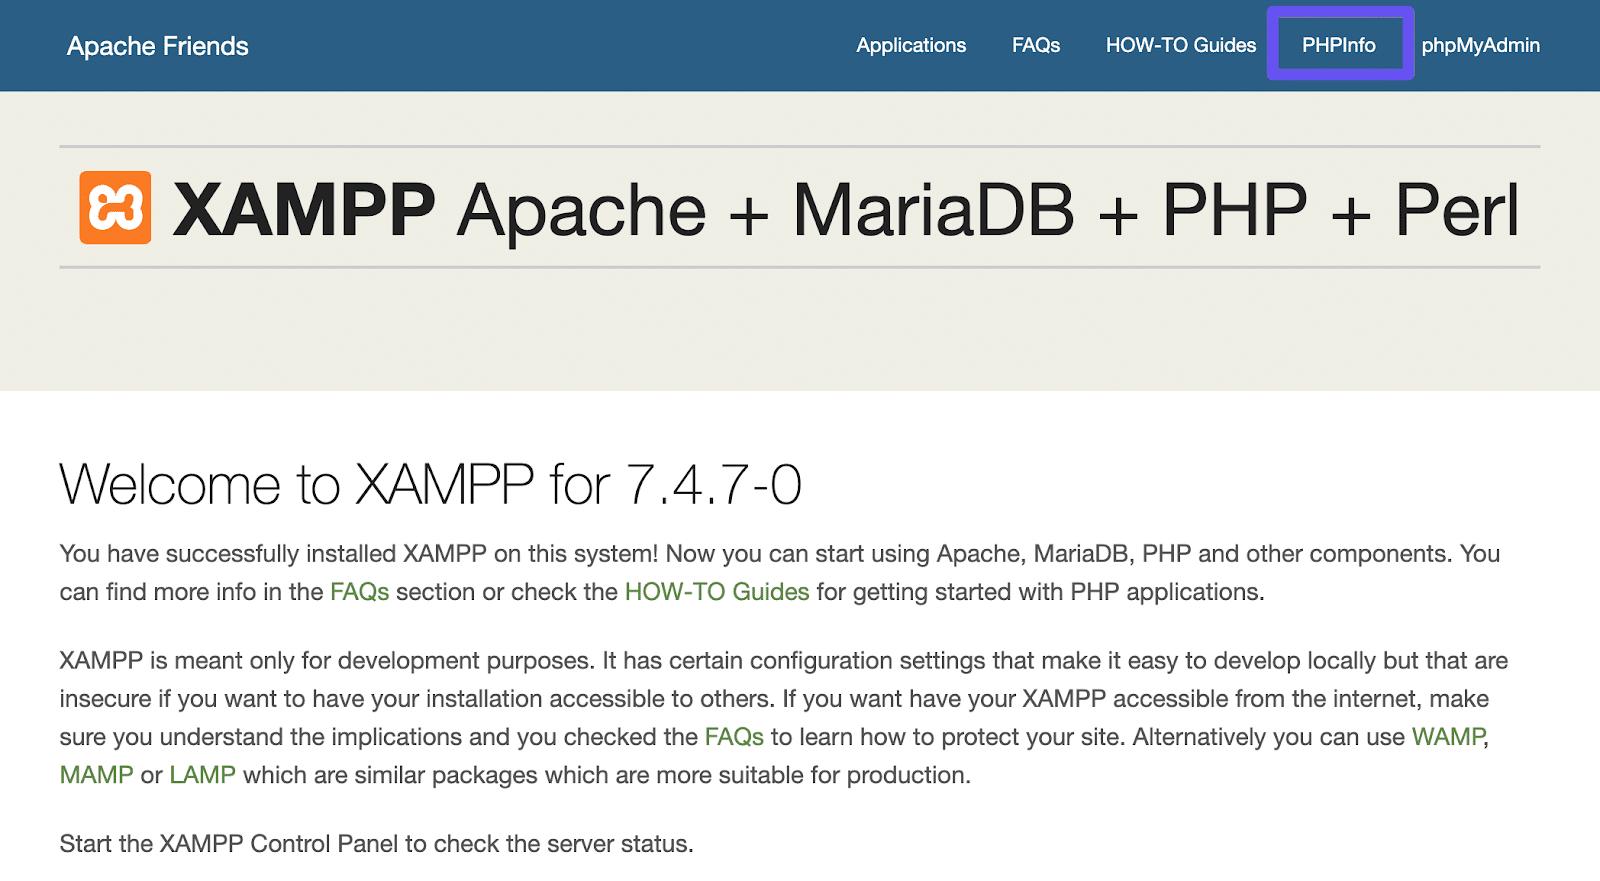 Der PHPInfo Link im XAMPP Dashboard